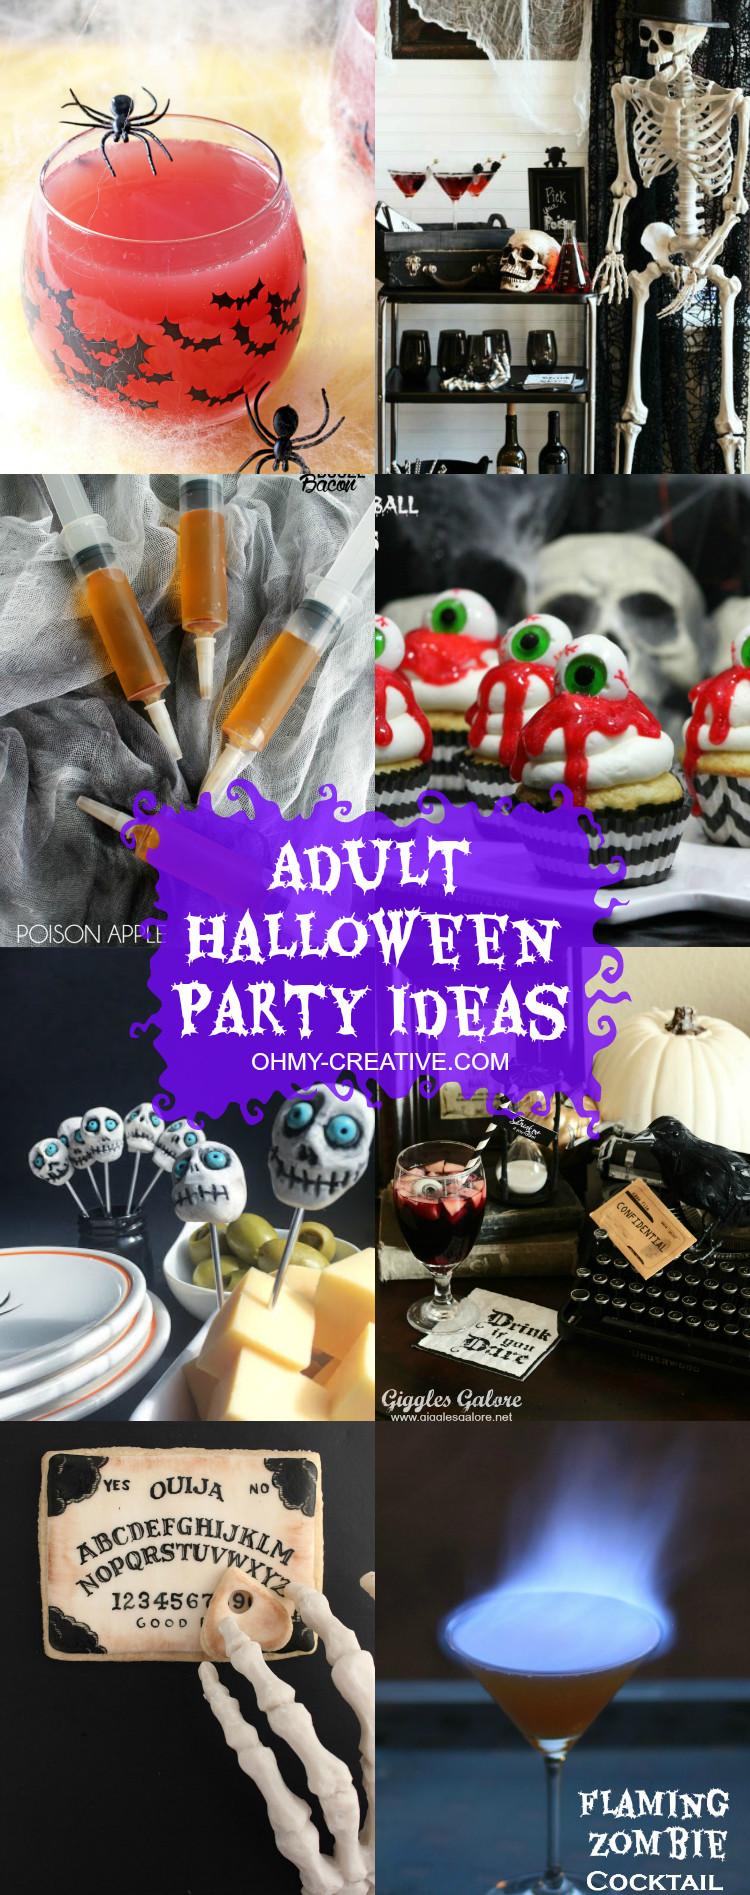 Creative Halloween Party Ideas  Adult Halloween Party Ideas Oh My Creative